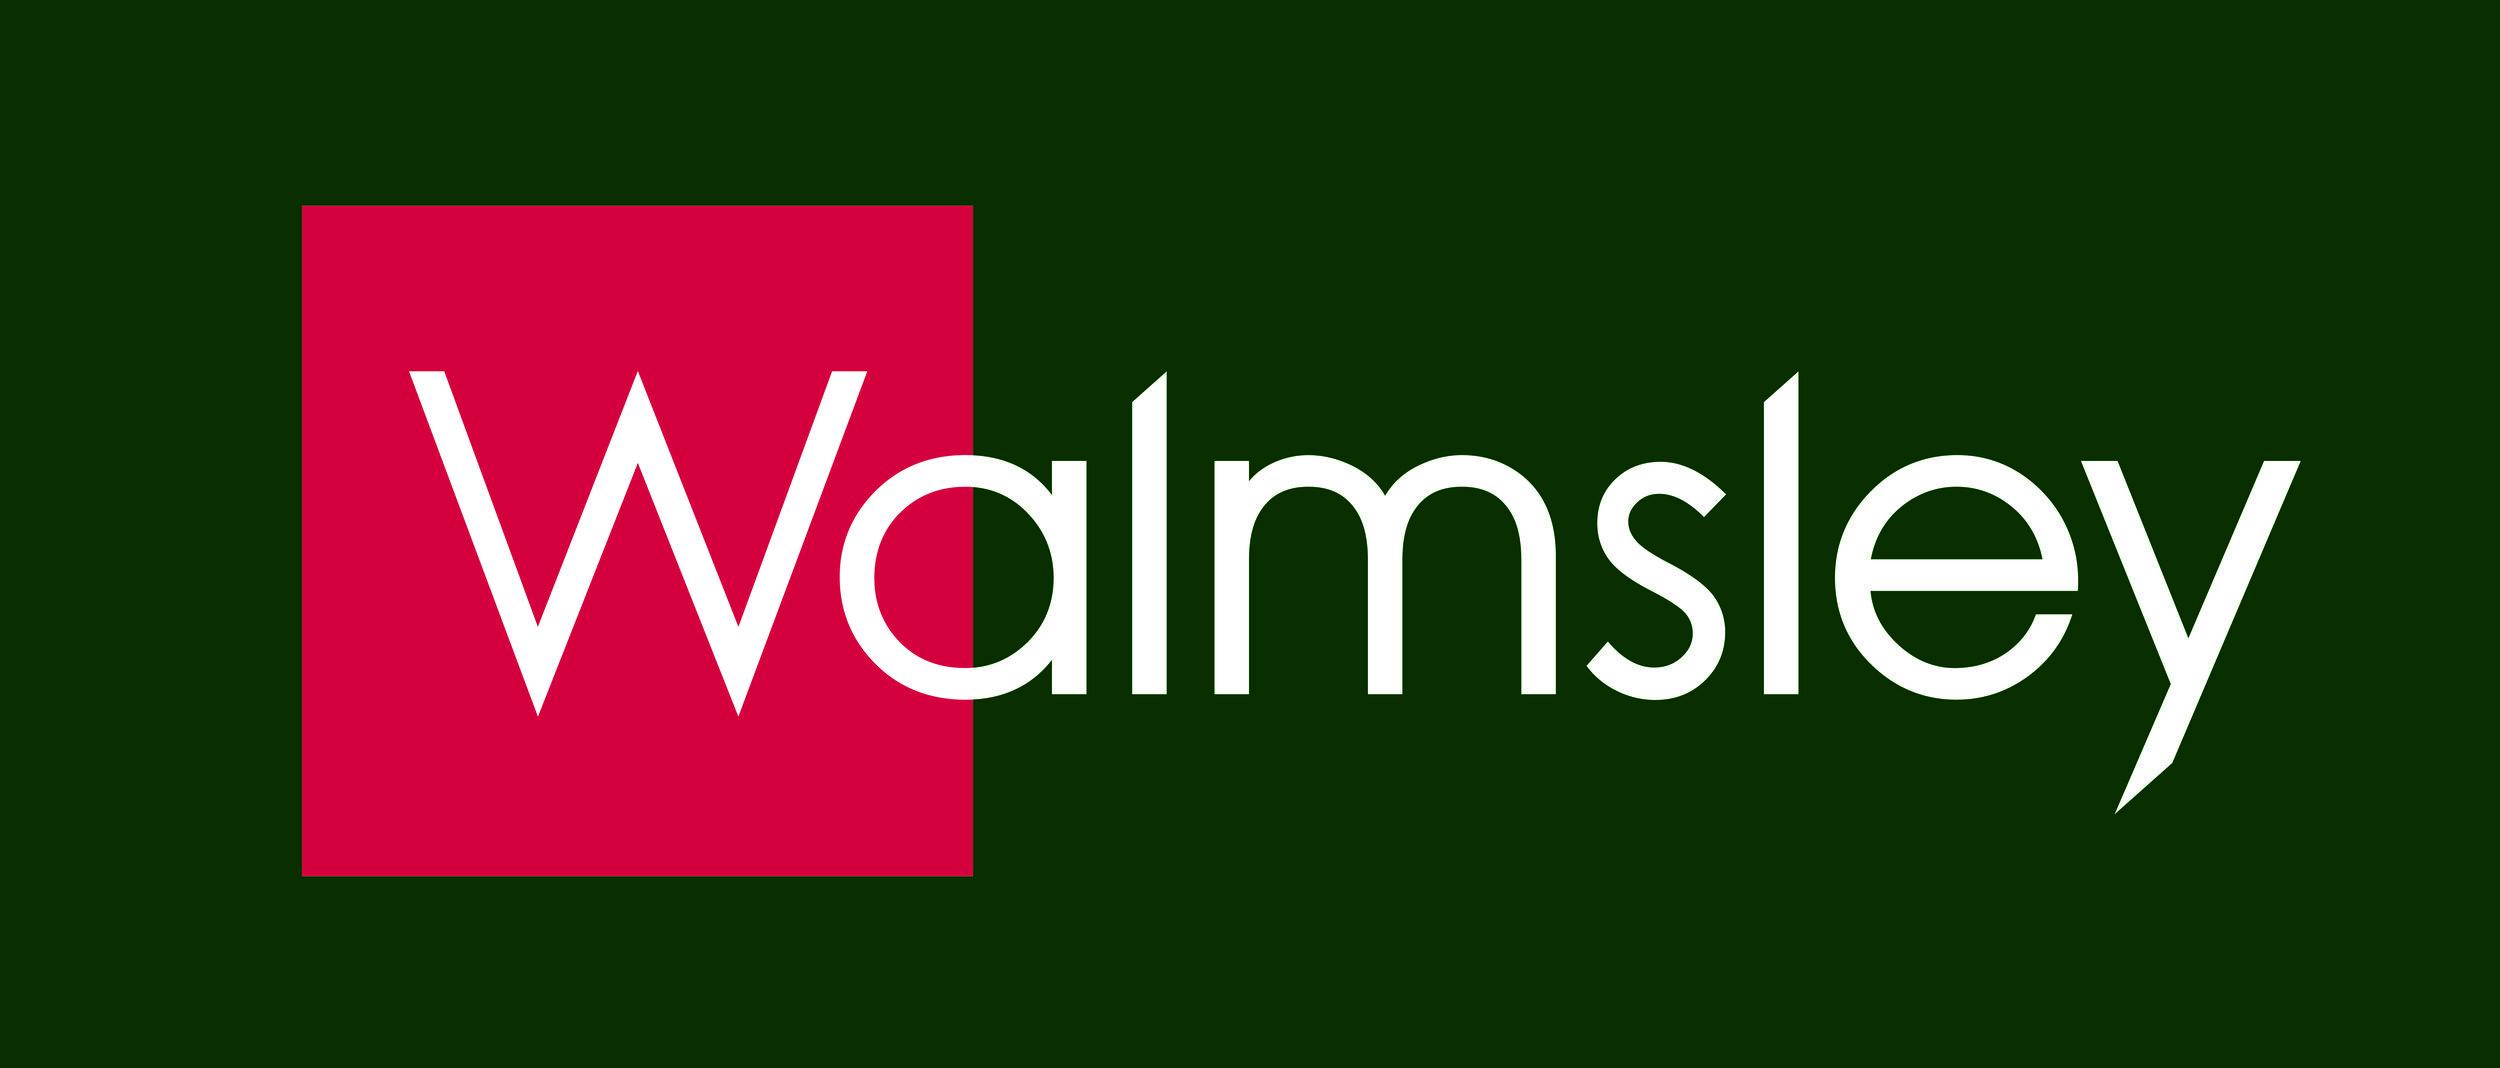 Walmsley Residential Lettings Limited, 9-11 Bridge Street, Caversham, Reading RG4 8AA  T: 0118 947 0511  E: lettings@walmsley.co.uk  W: www.walmsley.co.uk